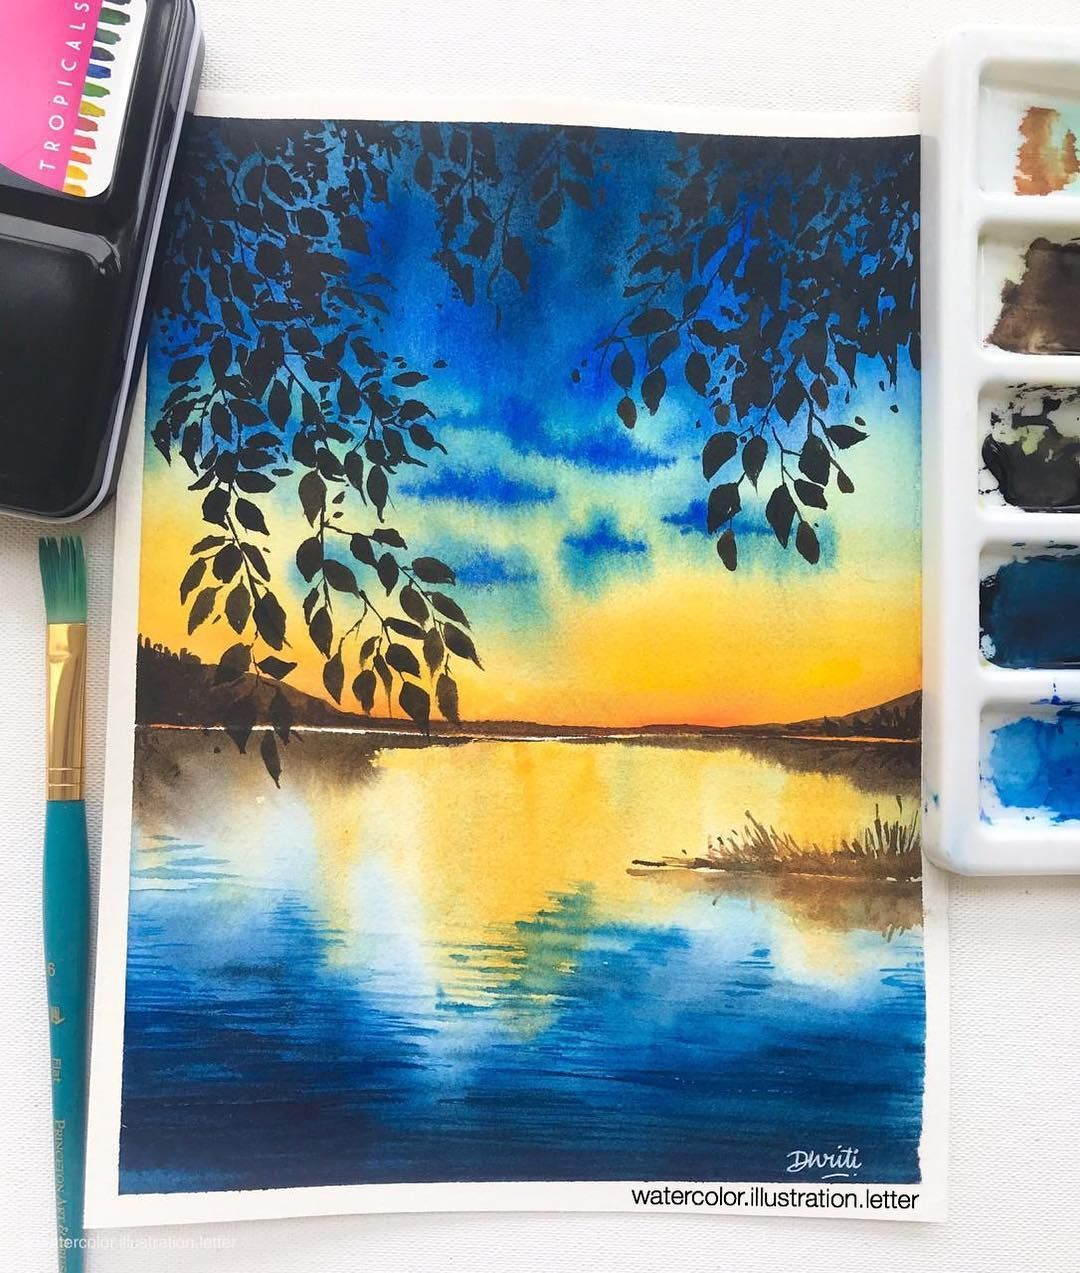 Watercolor Paintings Landscape In 2020 Watercolor Landscape Paintings Poster Color Painting Colorful Landscape Paintings